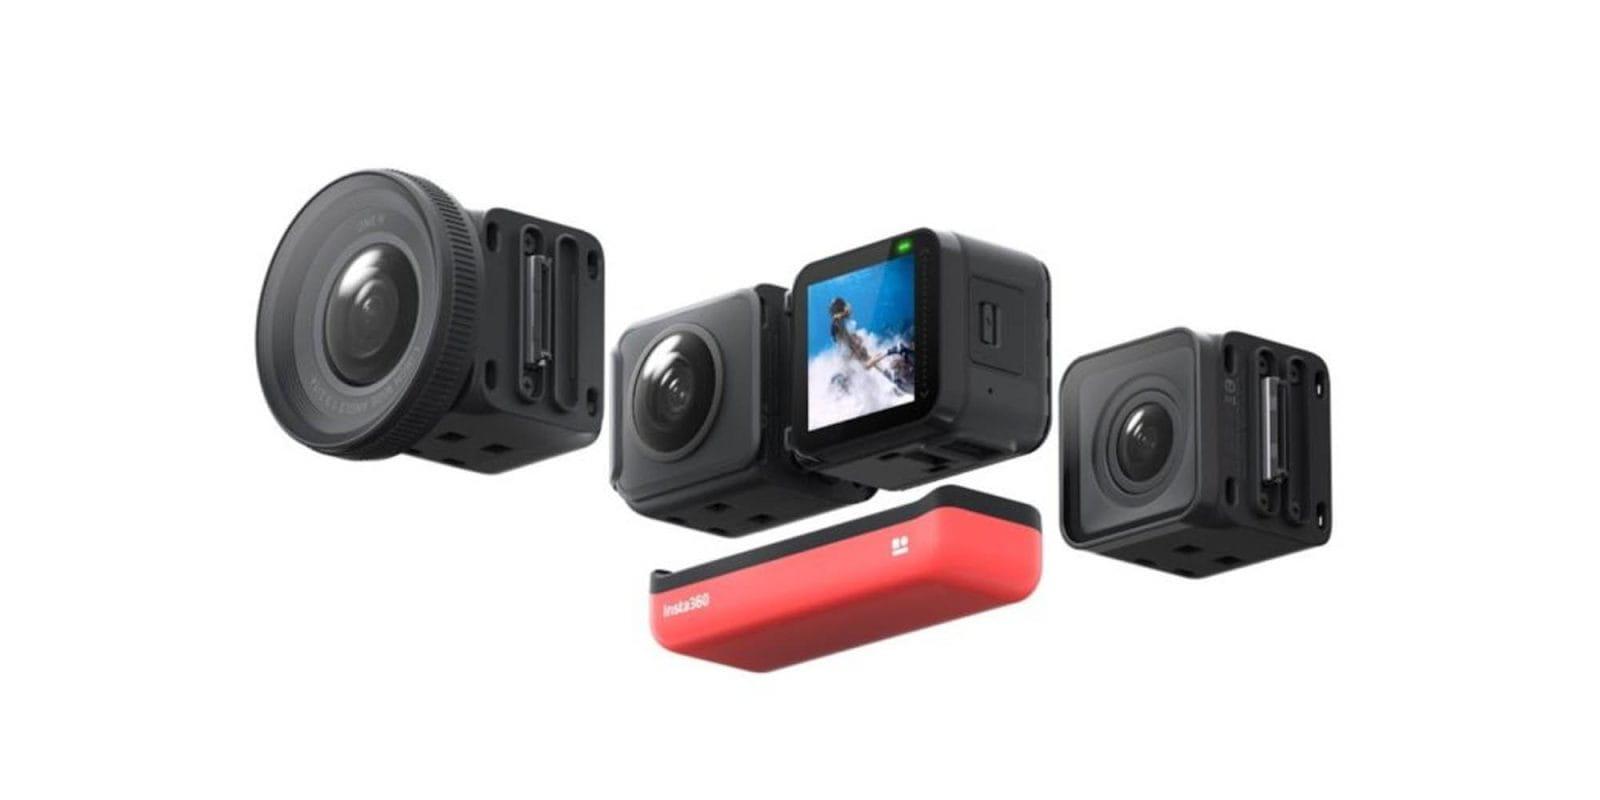 مقارنة بين DJI Osmo Action و GoPro 8 وبين Insta360 One R - مراجعات